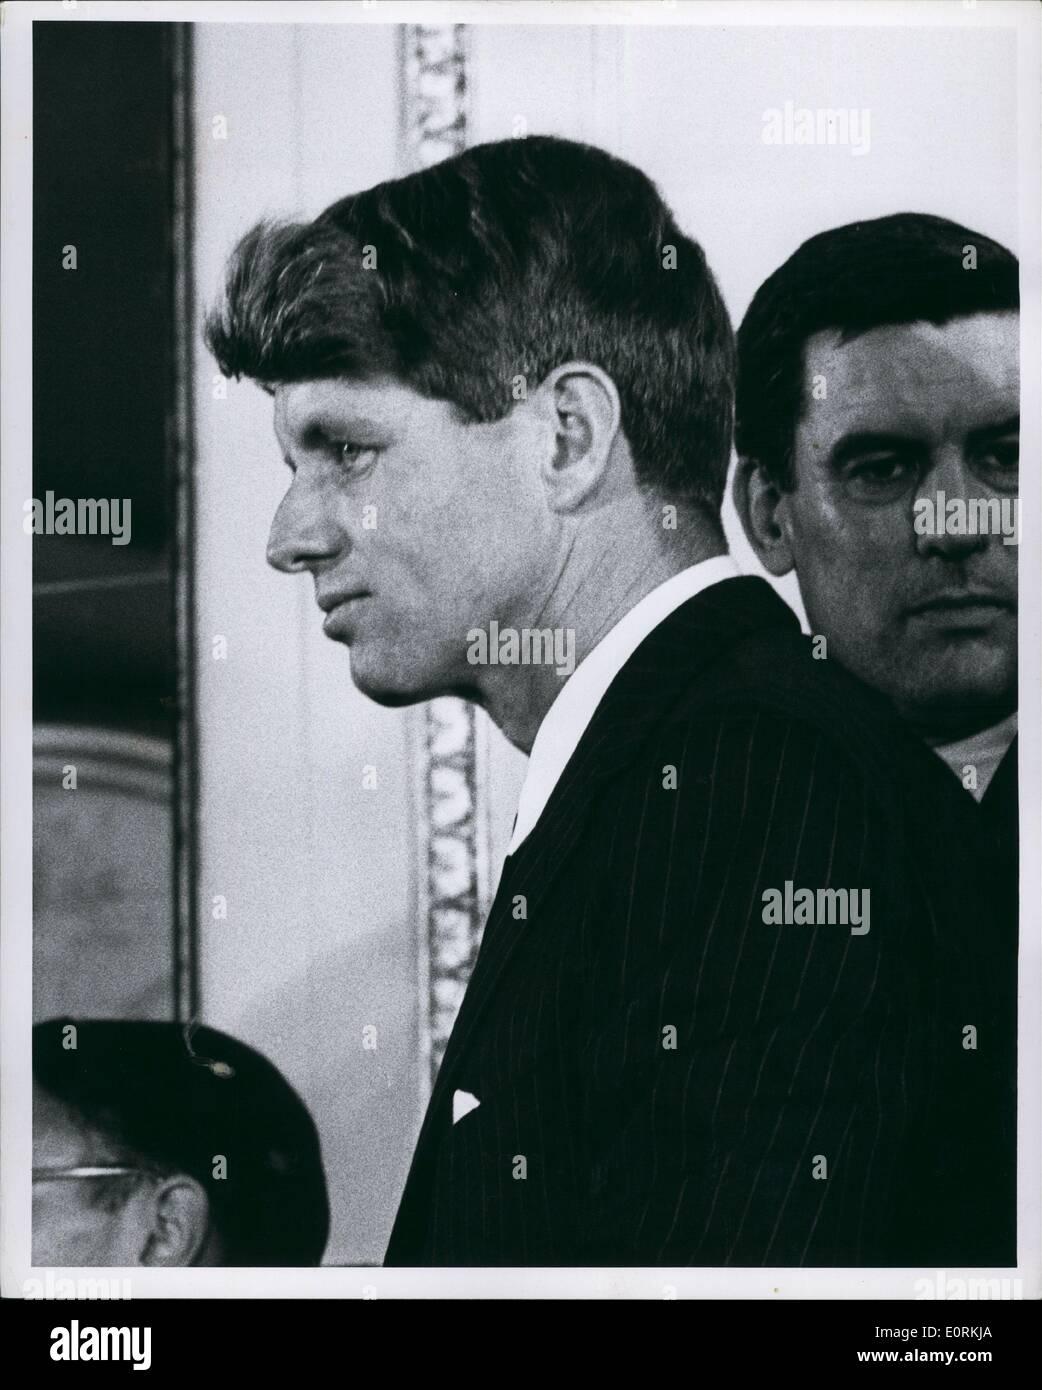 Jan 1, 1960 - RFK at Samuel Silverman Campaign New York 1966. - Stock Image